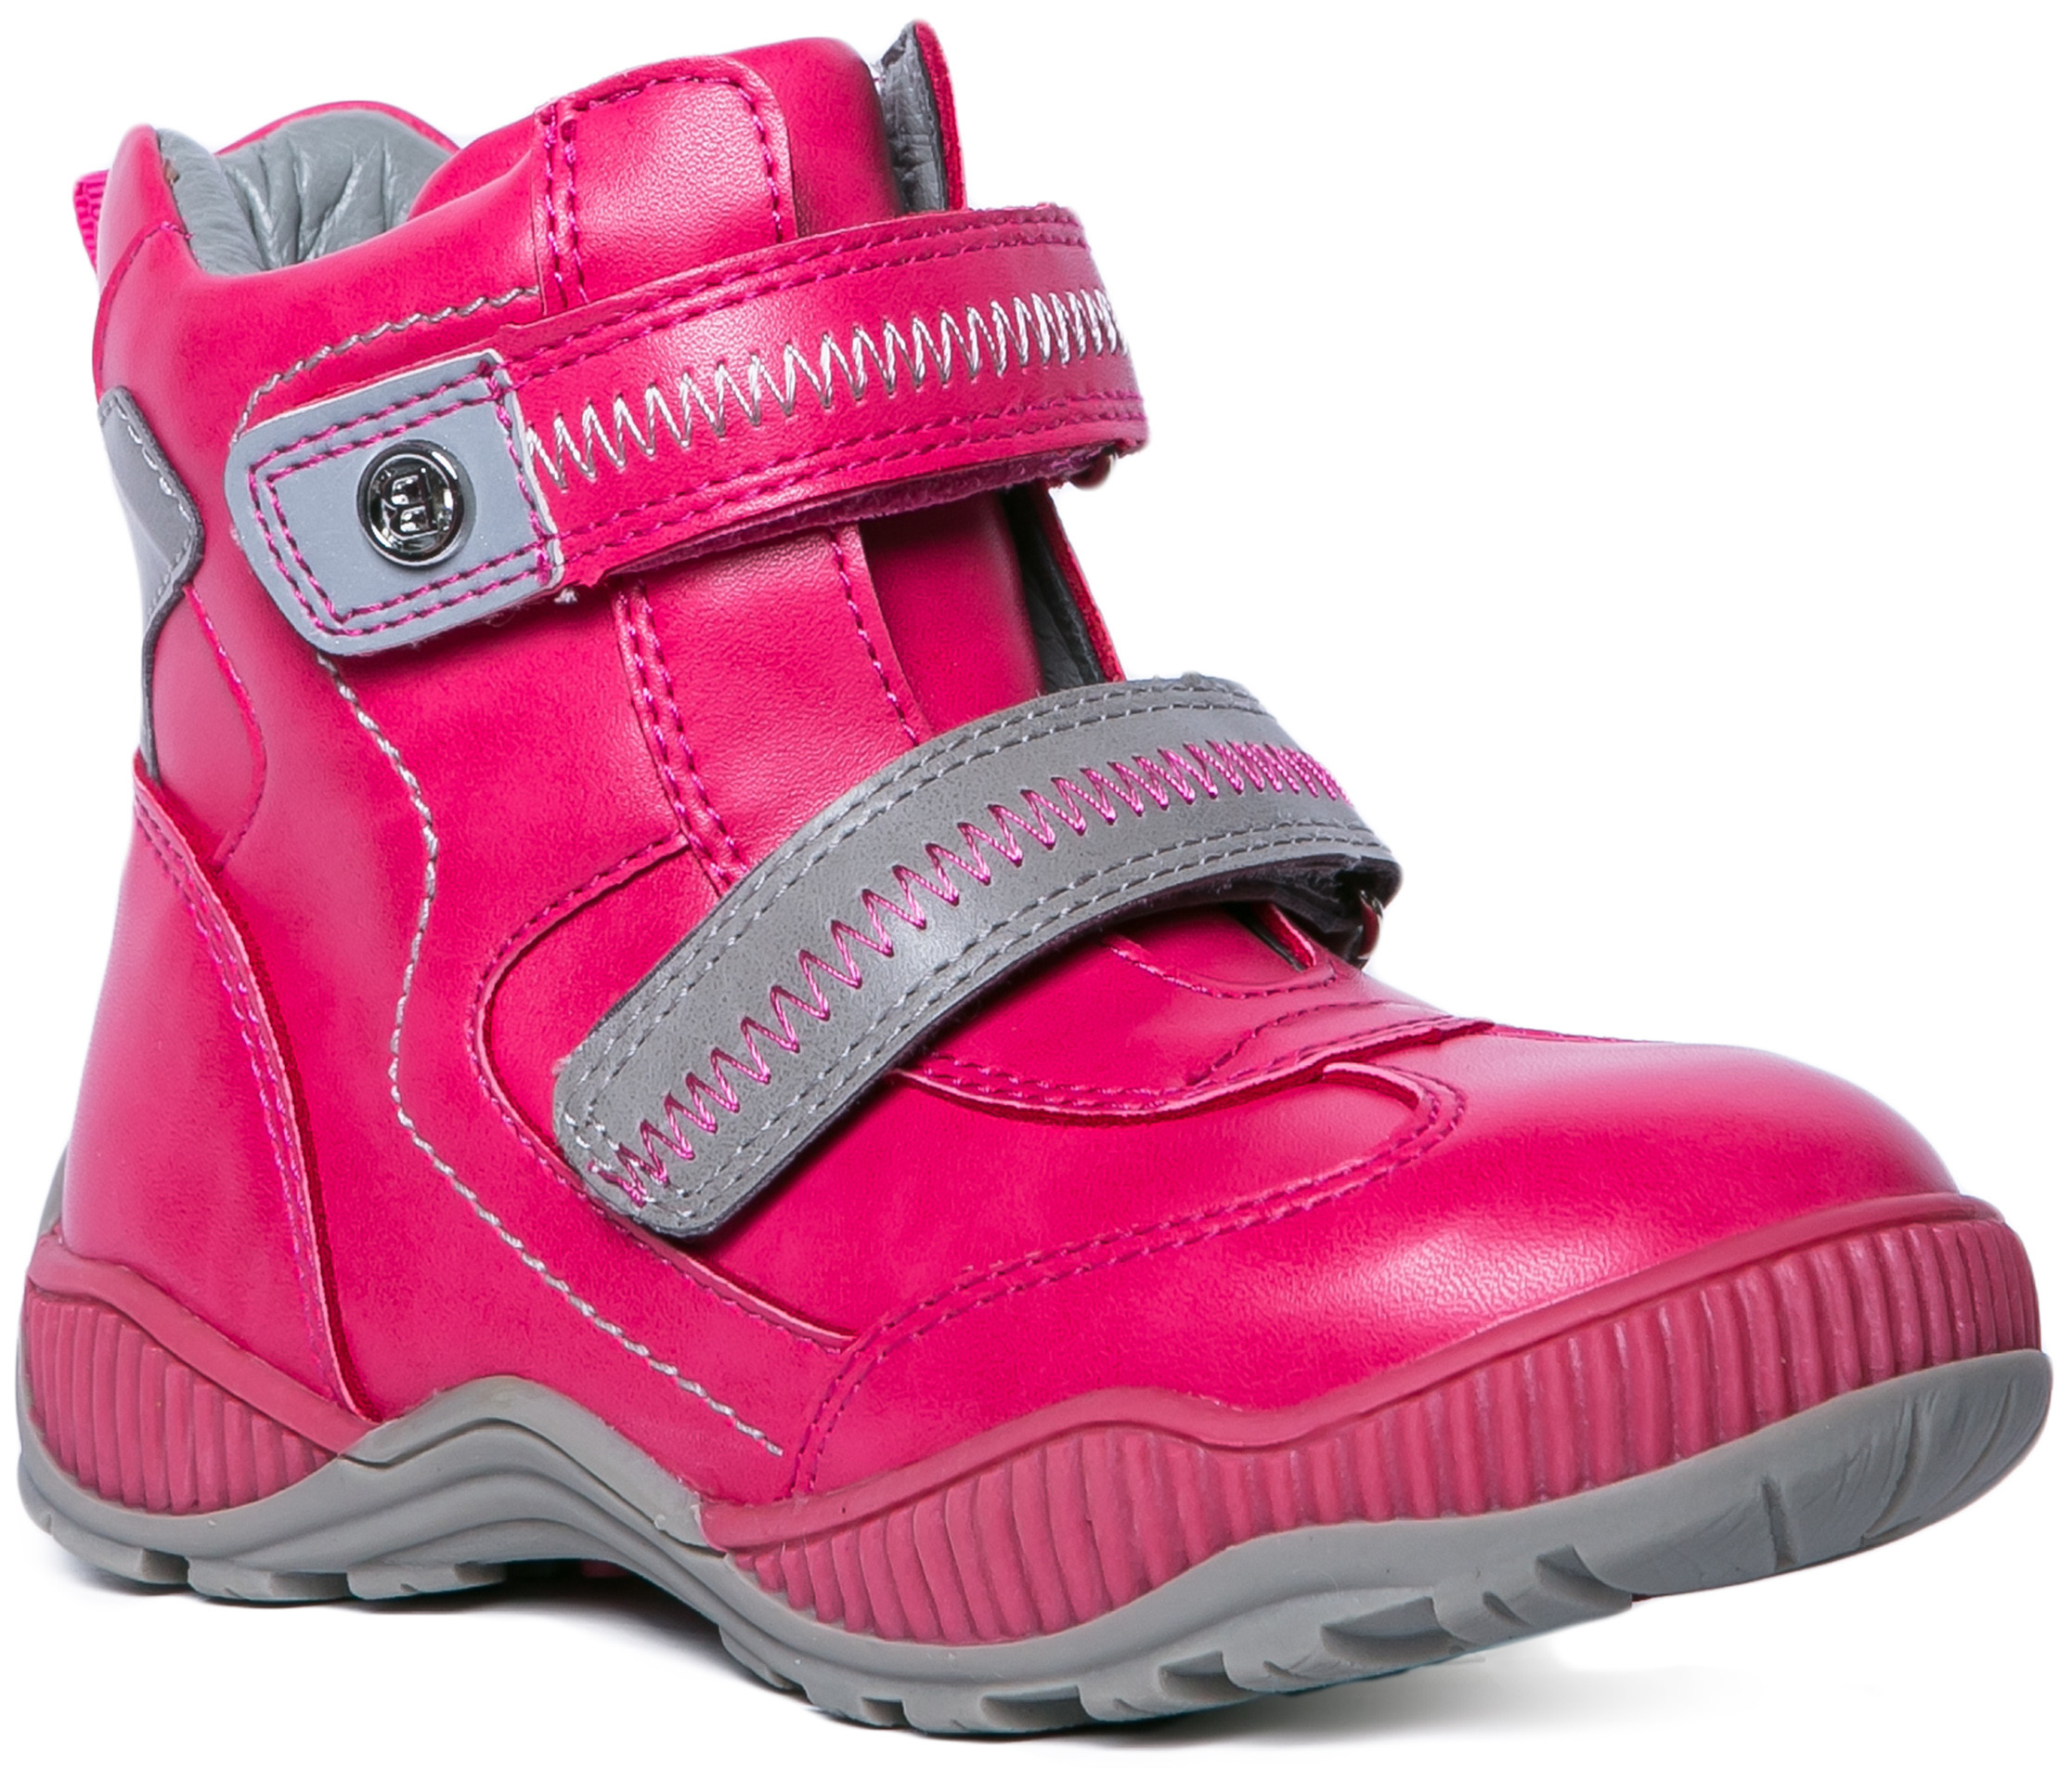 Ботинки и полуботинки Barkito Ботинки для девочки Barkito, фуксия coclico ботинки